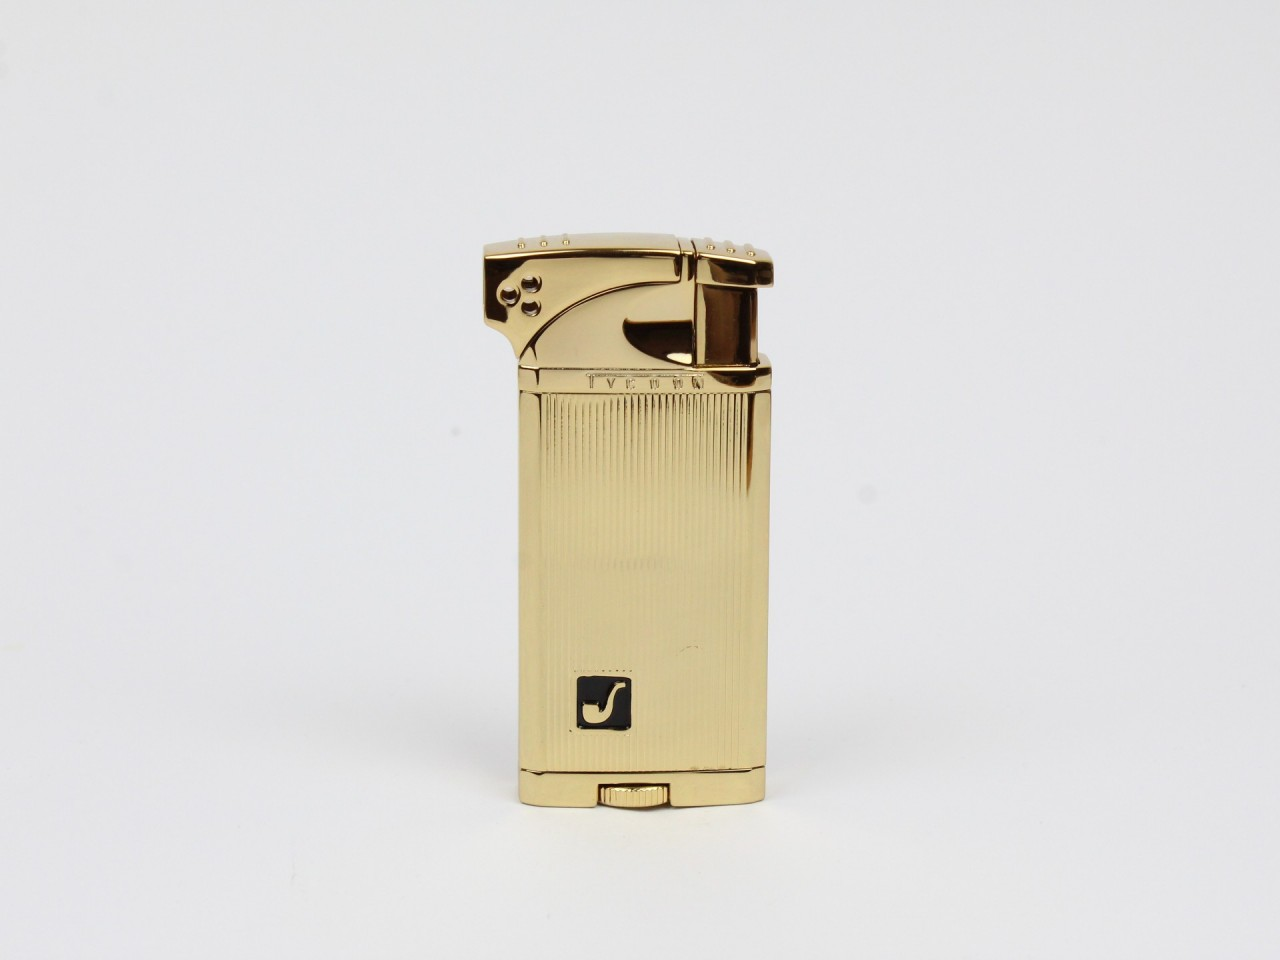 Tycoon Pfeifenfeuerzeug gold